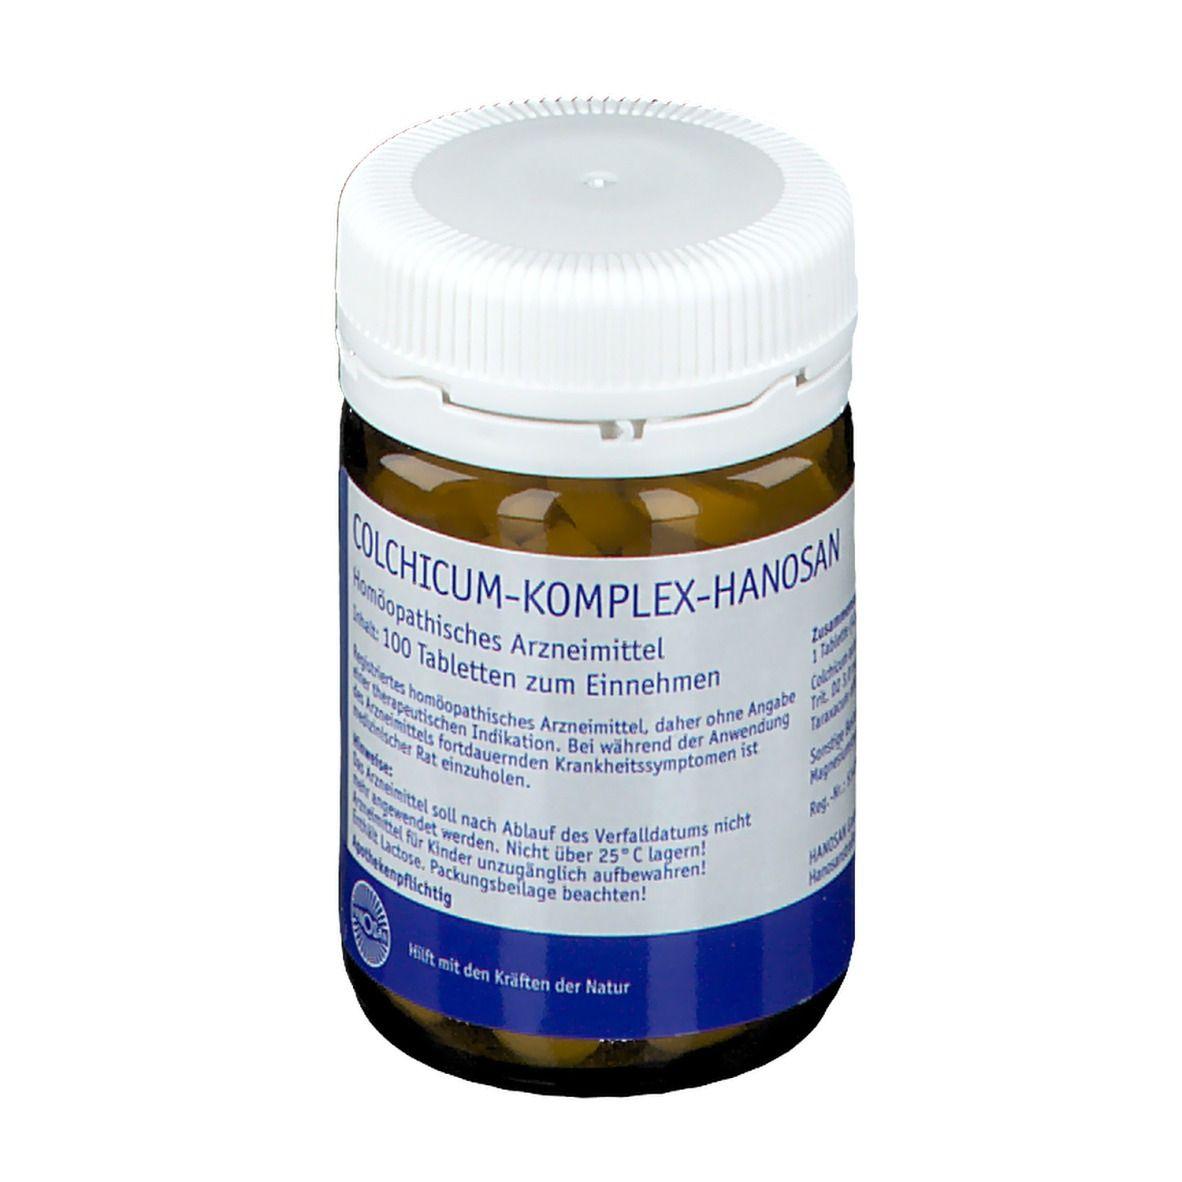 Colchicum-Komplex-Hanosan